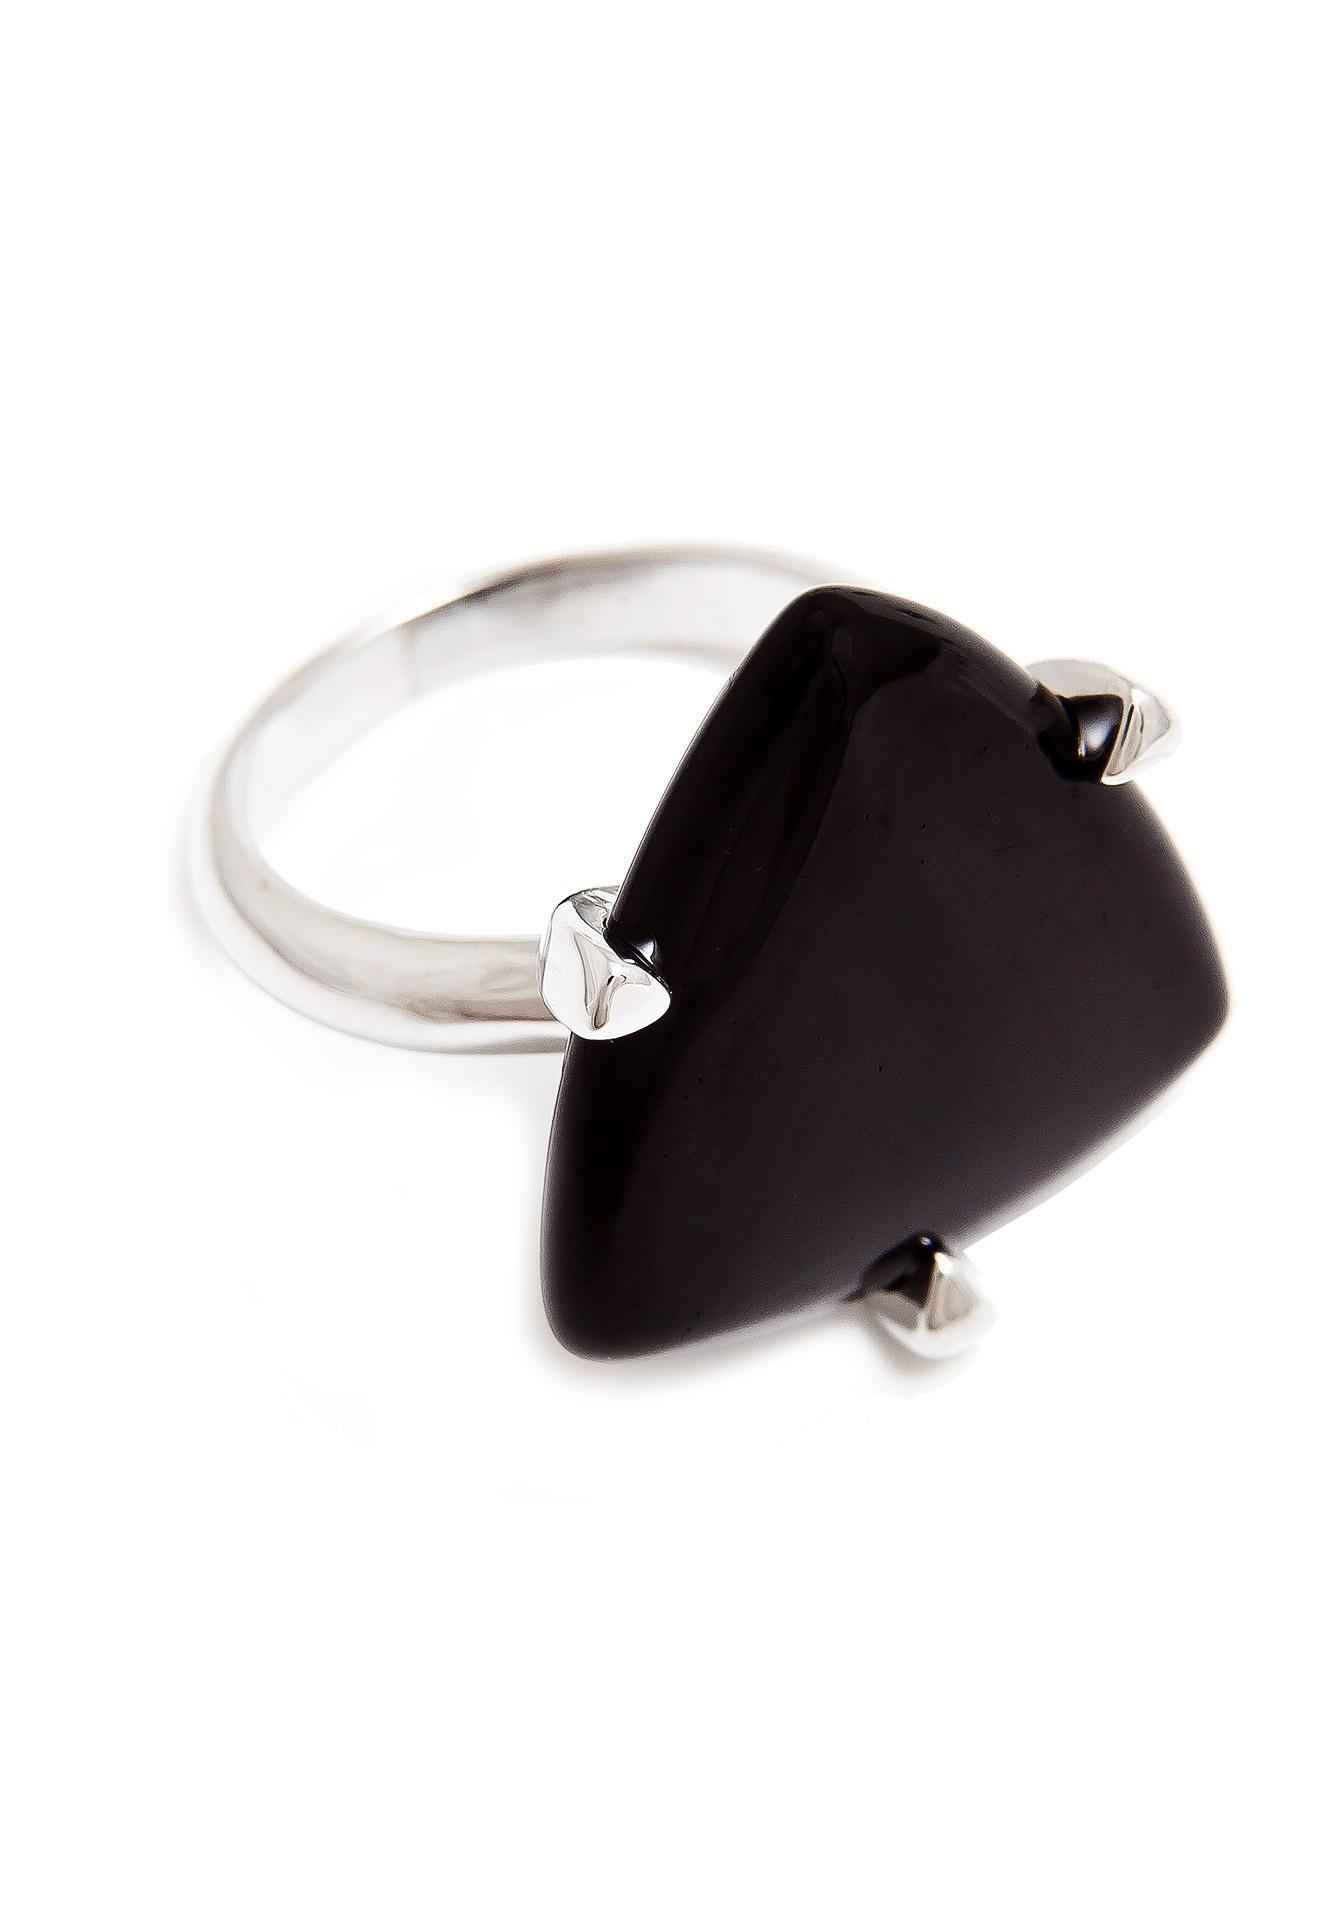 Кольцо Aiyony Macie, серебряный, R710011, размер 17R710011Размер 48 см * 0,5 см Состав: сплав на основе латуни, дерево, пластик